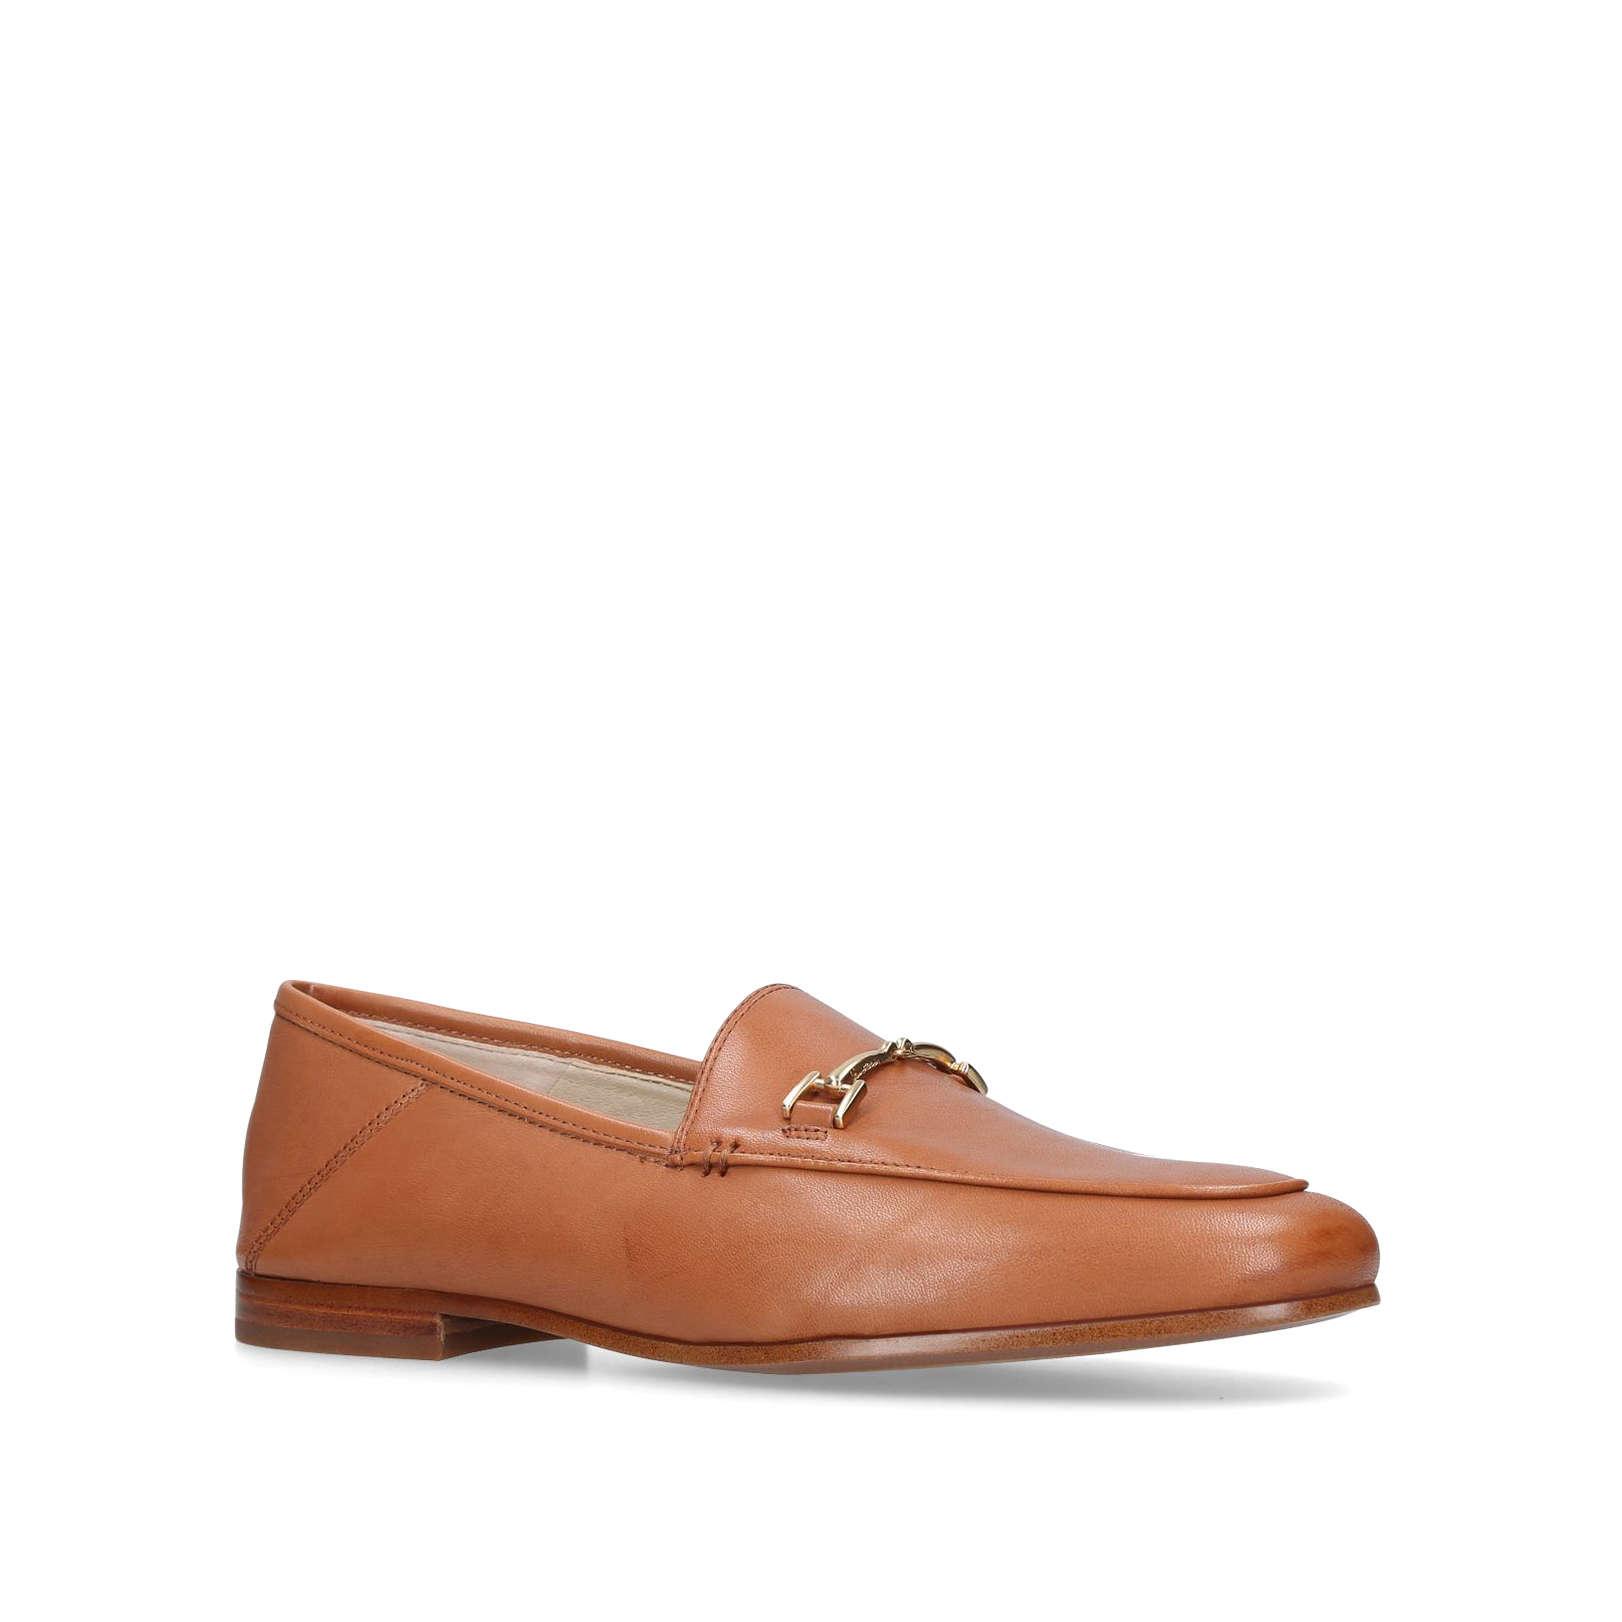 76607e209 LORAINE LOAFER Loraine Loafer No Heel Flats Sam Edelman Brown by SAM EDELMAN